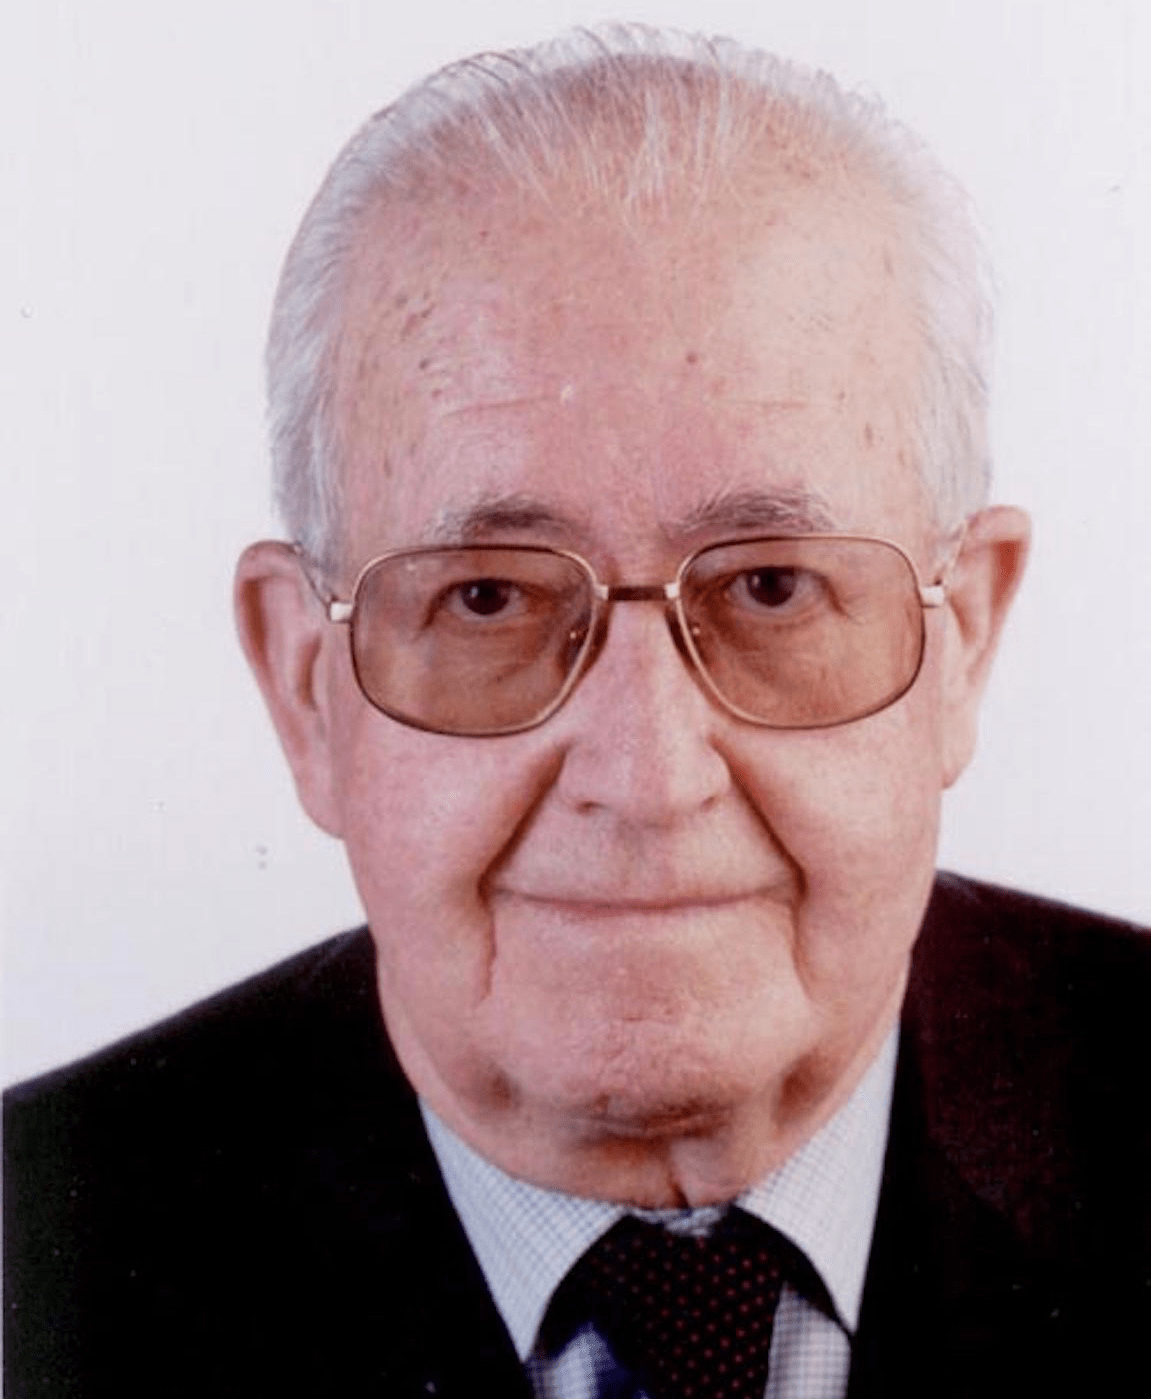 don pedro roncero menchen - Don Pedro Roncero: Setenta años de vida sacerdotal